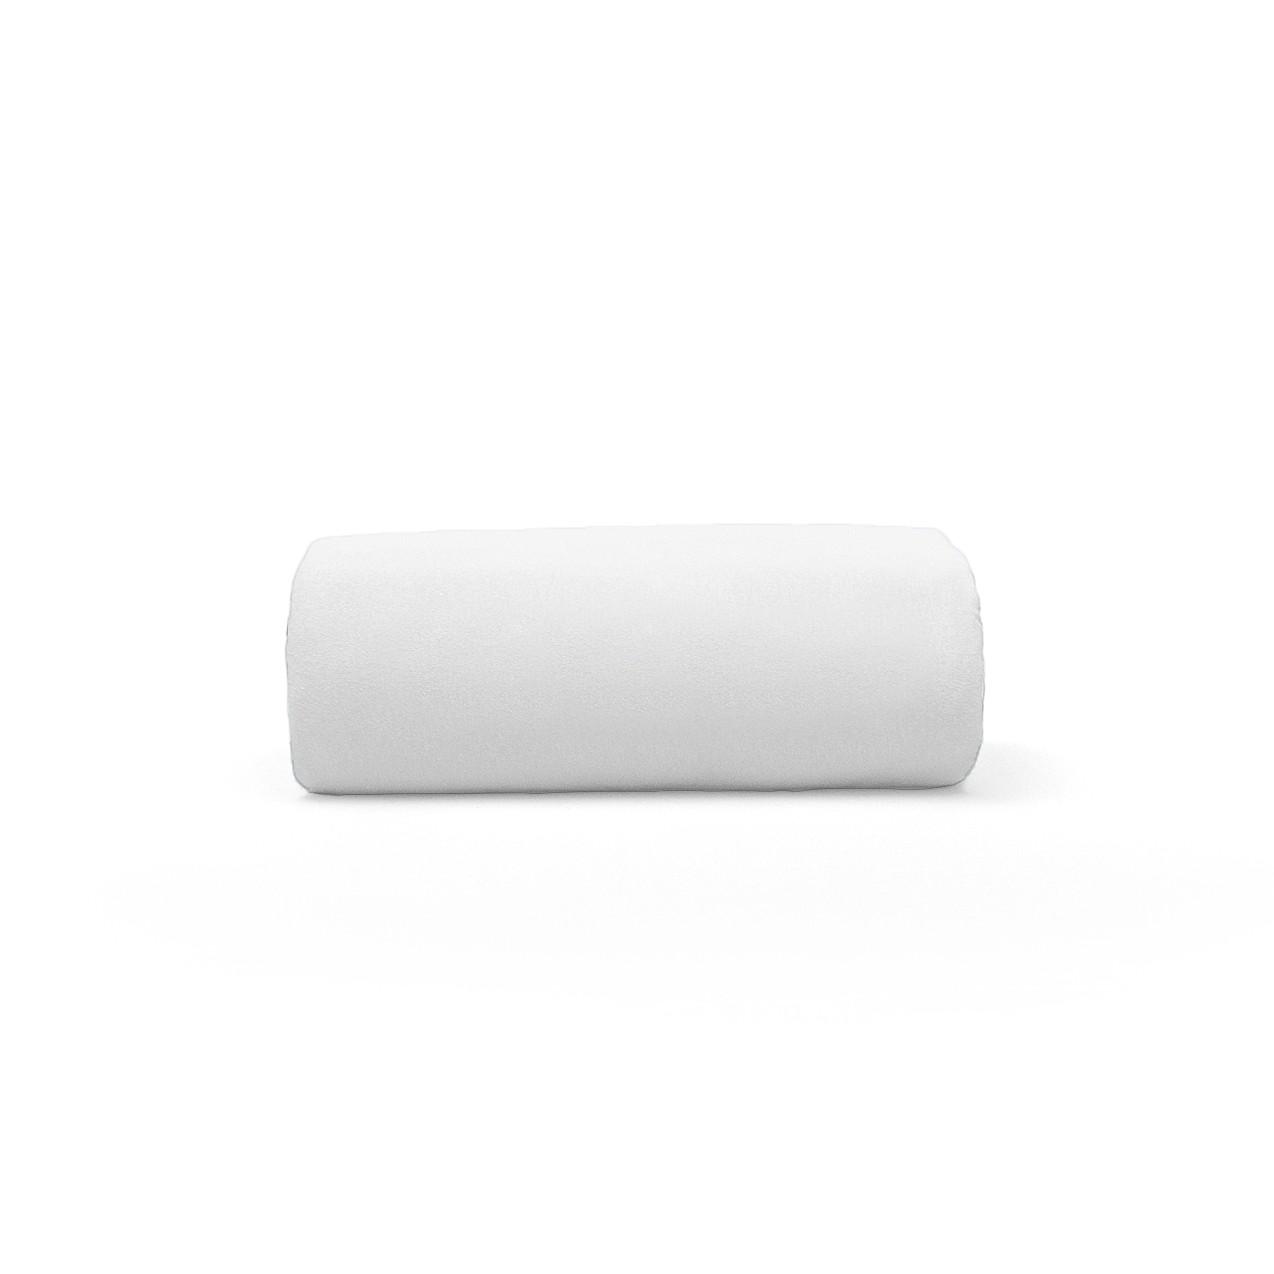 Lencol Malha Casal Art Premium com Elastico 100 algodao Branco - Buettner